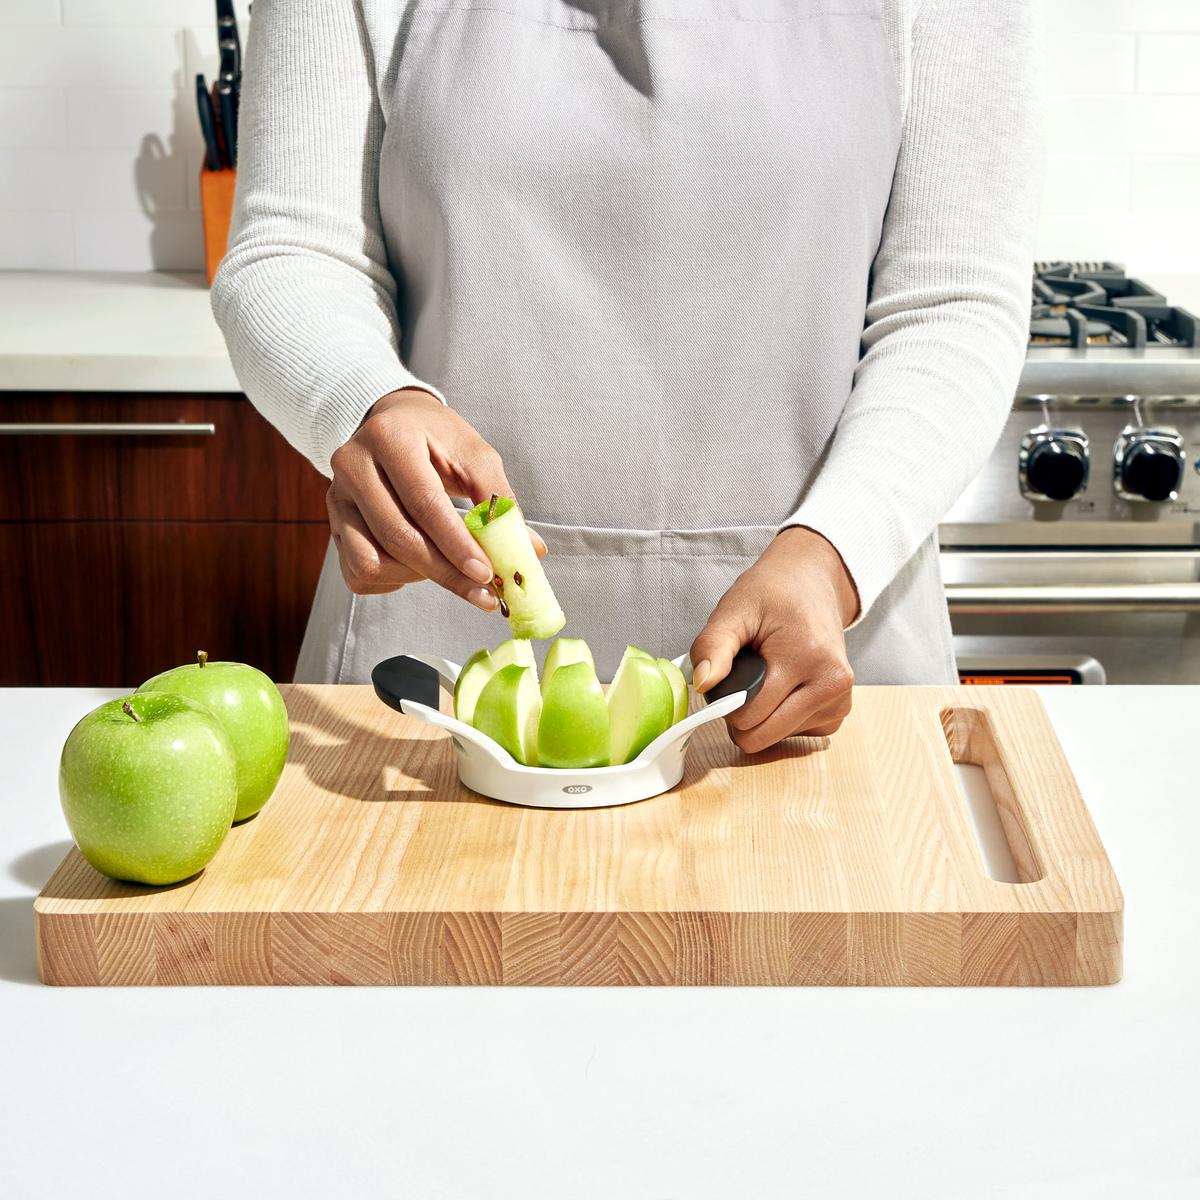 Нож для яблок OXO FRUIT & VEGETABLES, 11х6х22 см, белый OXO 32681 фото 3